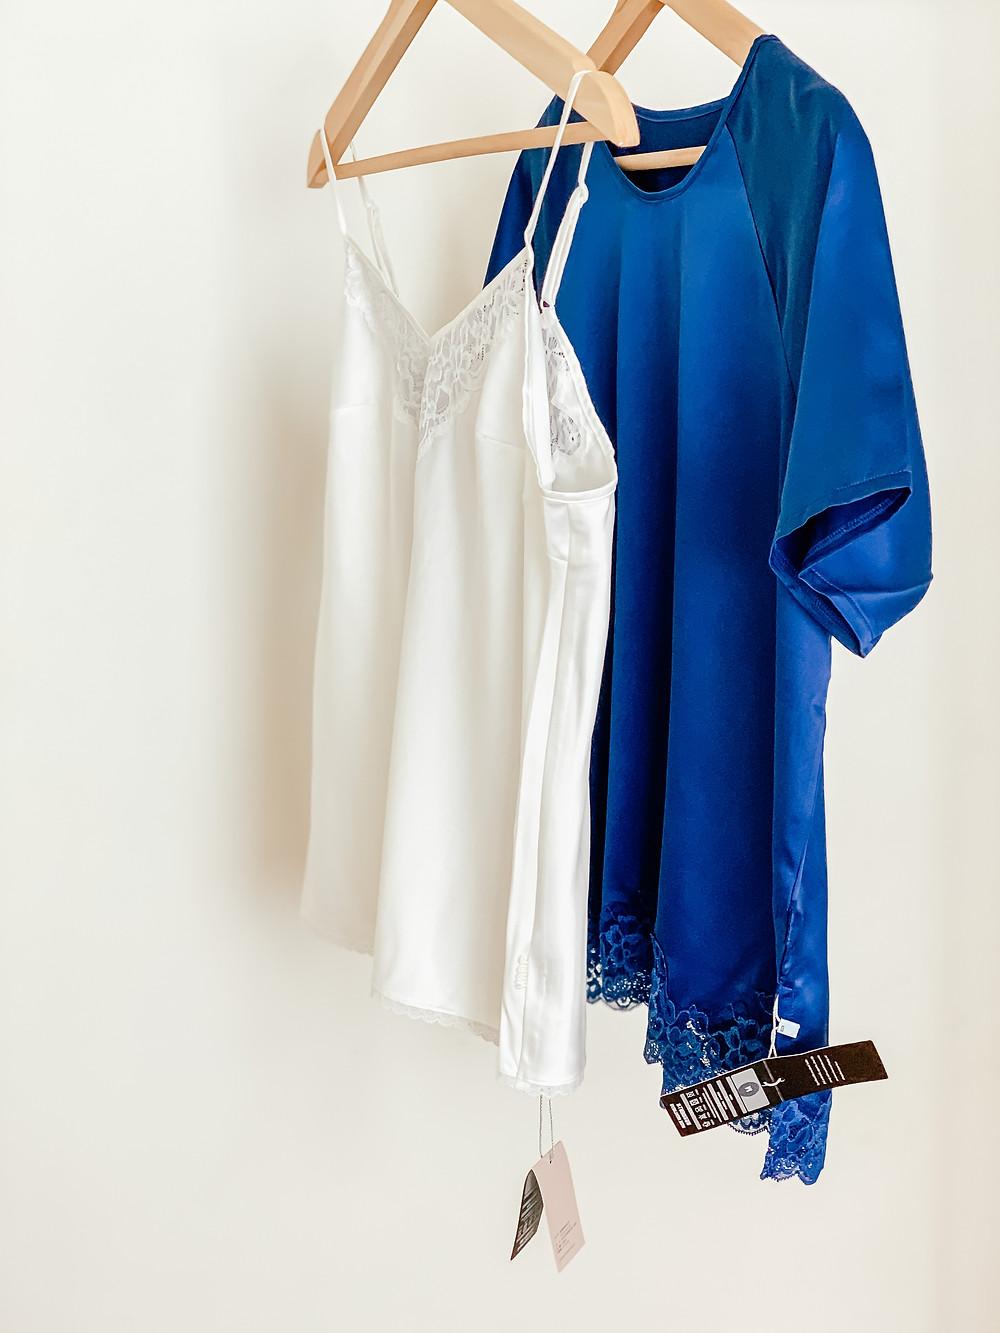 Lovely Loungewear | NUDE Sleepwear and Lingerie |  Taipei | A Style Alike